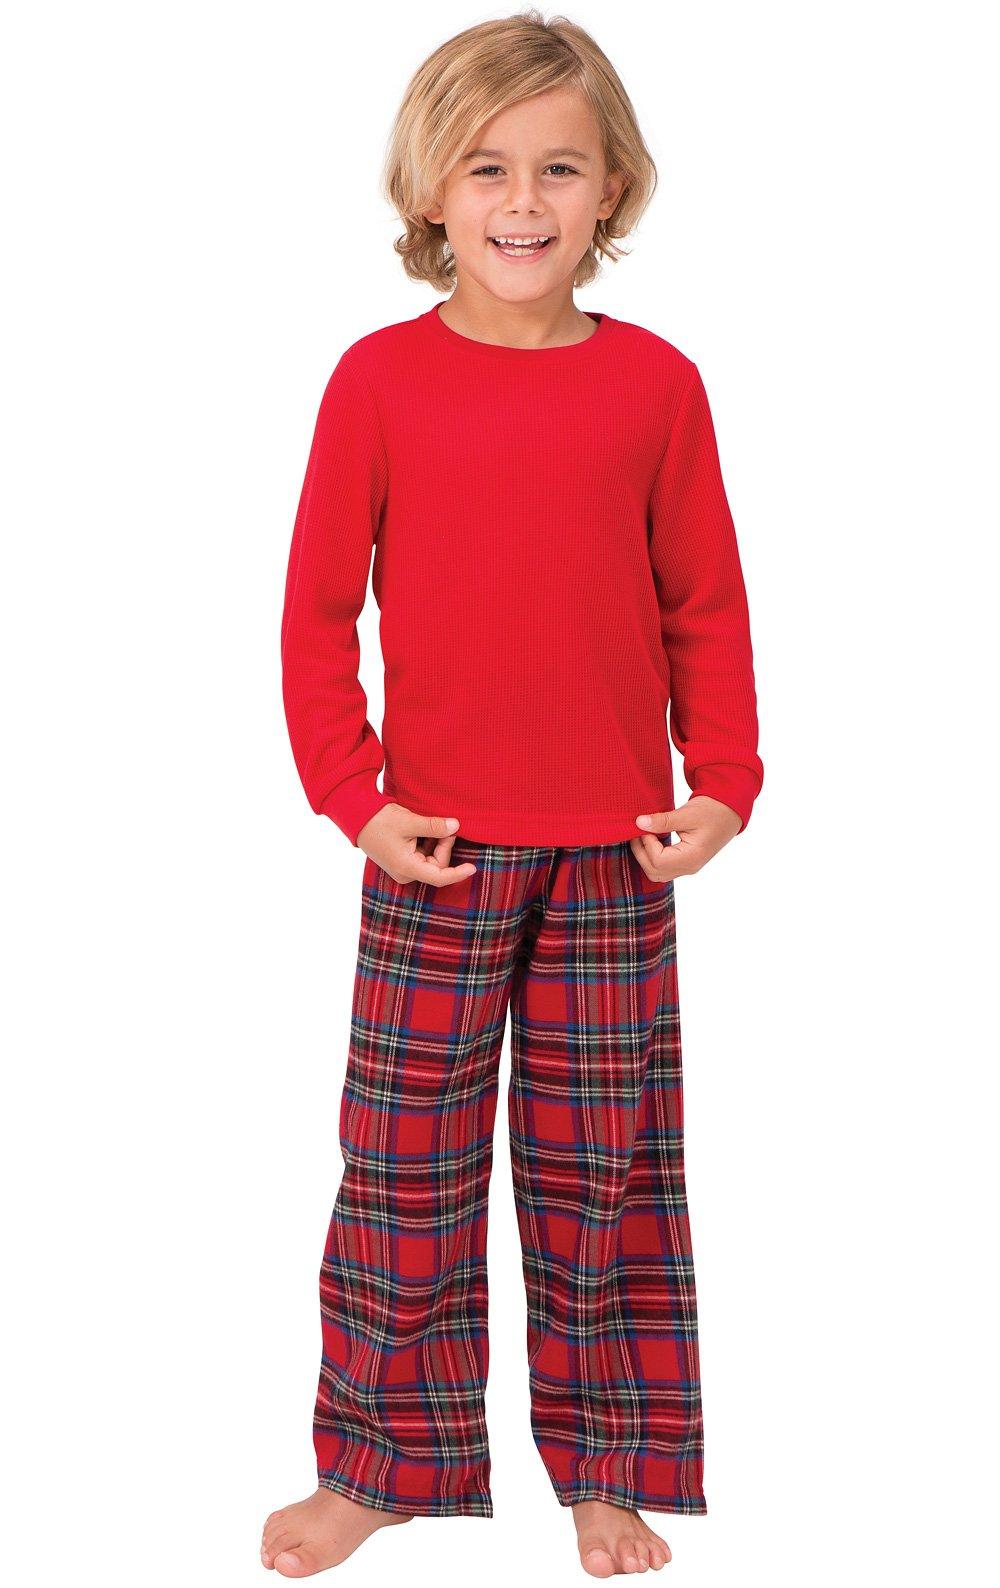 PajamaGram Red Flannel Stewart Plaid Pajamas with Thermal Top, Red, Big Boys' 14